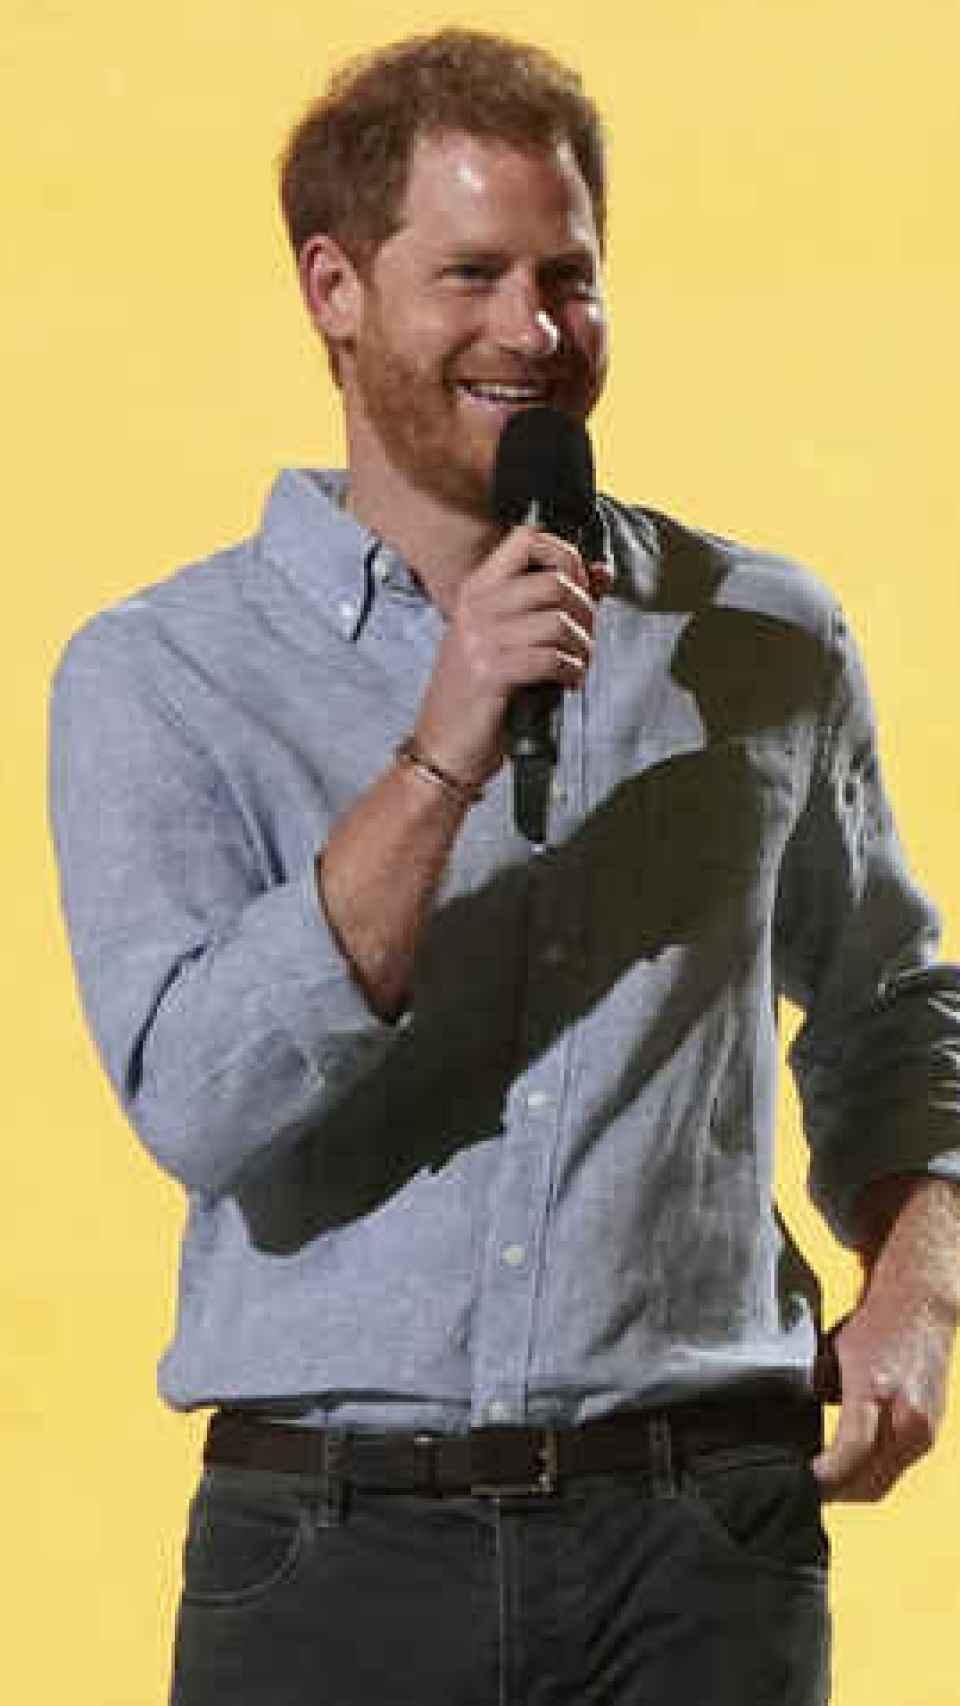 Harry en medio de su discurso en el VAX Live: The Concert to Reunite the World de Global Citizen.